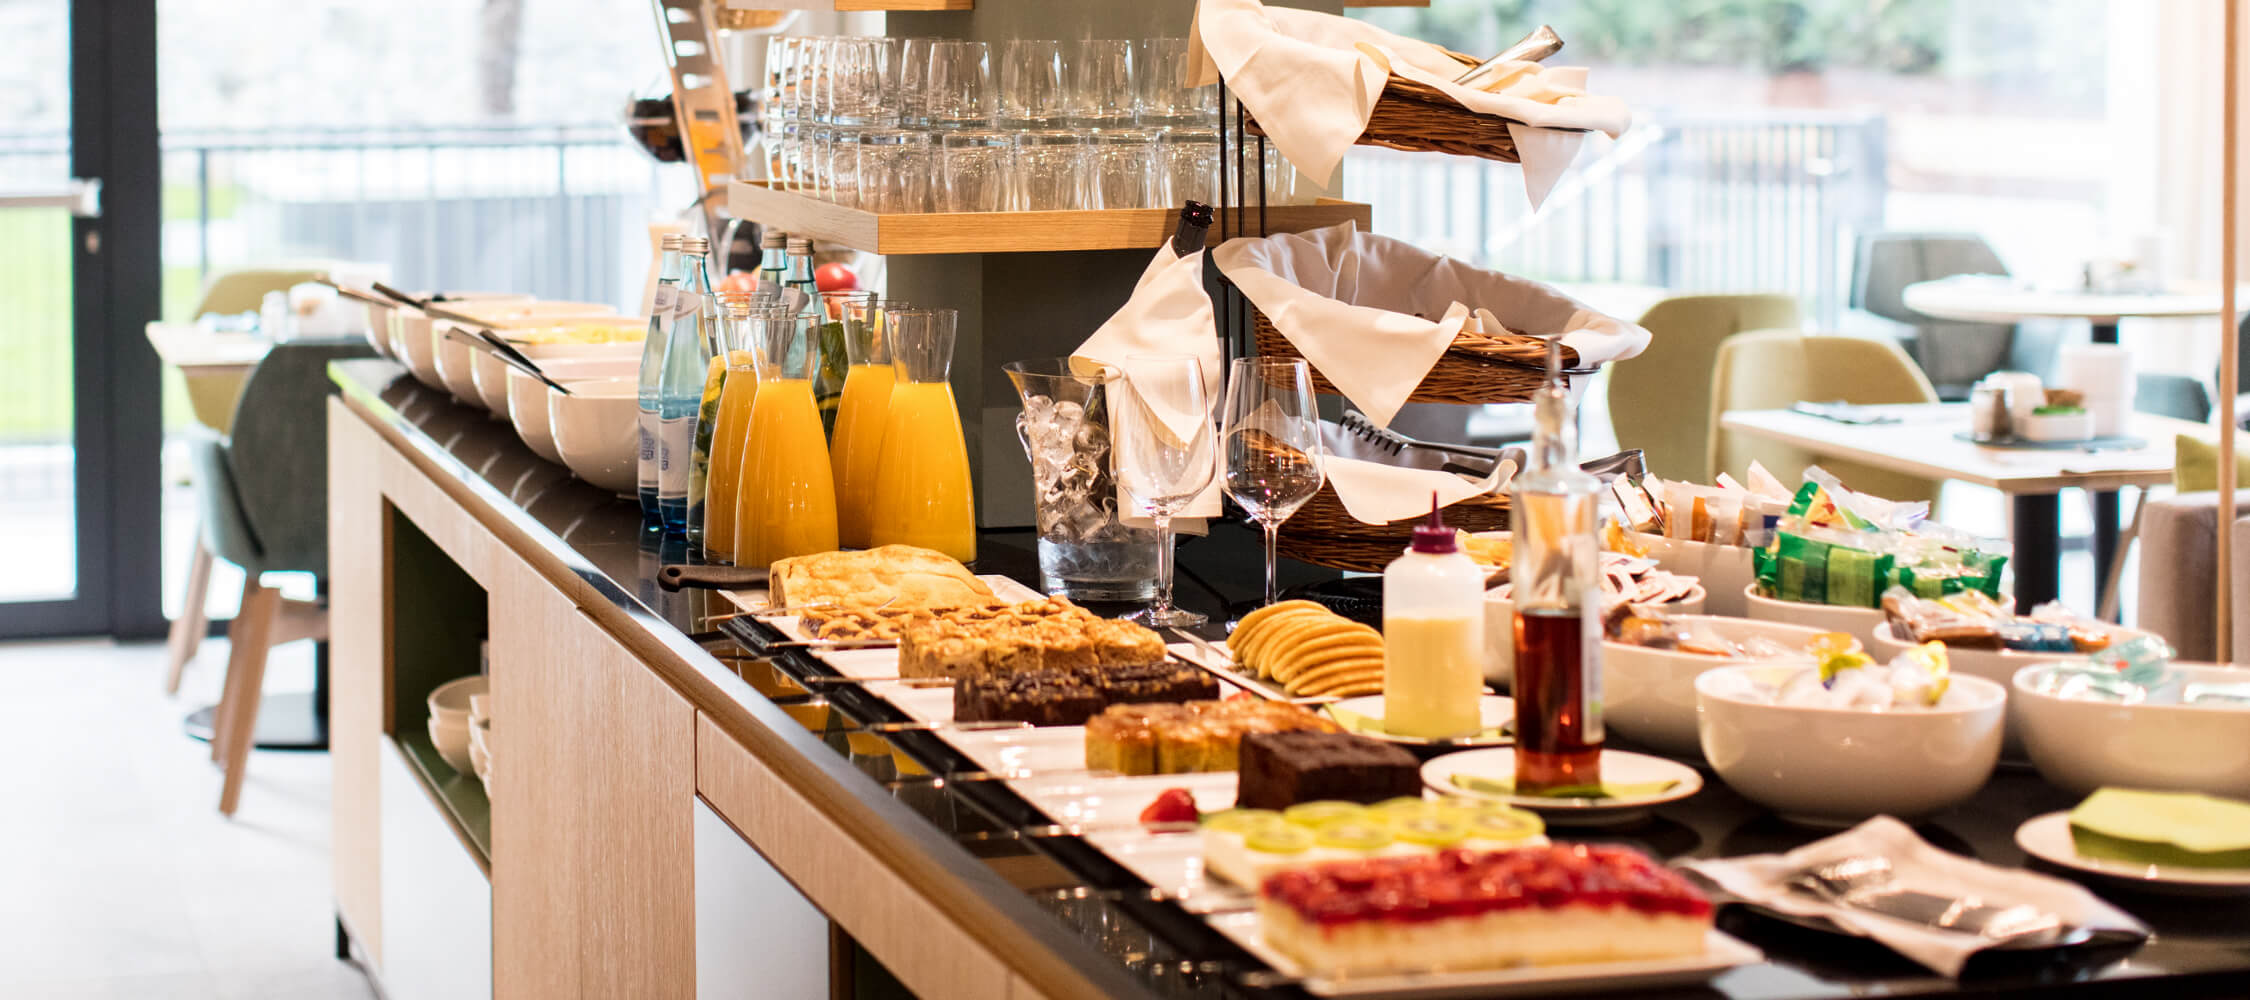 Hotel_Flora_Merano_Restaurant_Breakfast_Buffet_Fruehstueck_Essen_BeatricePilotto_3T1A3557_2250x1000